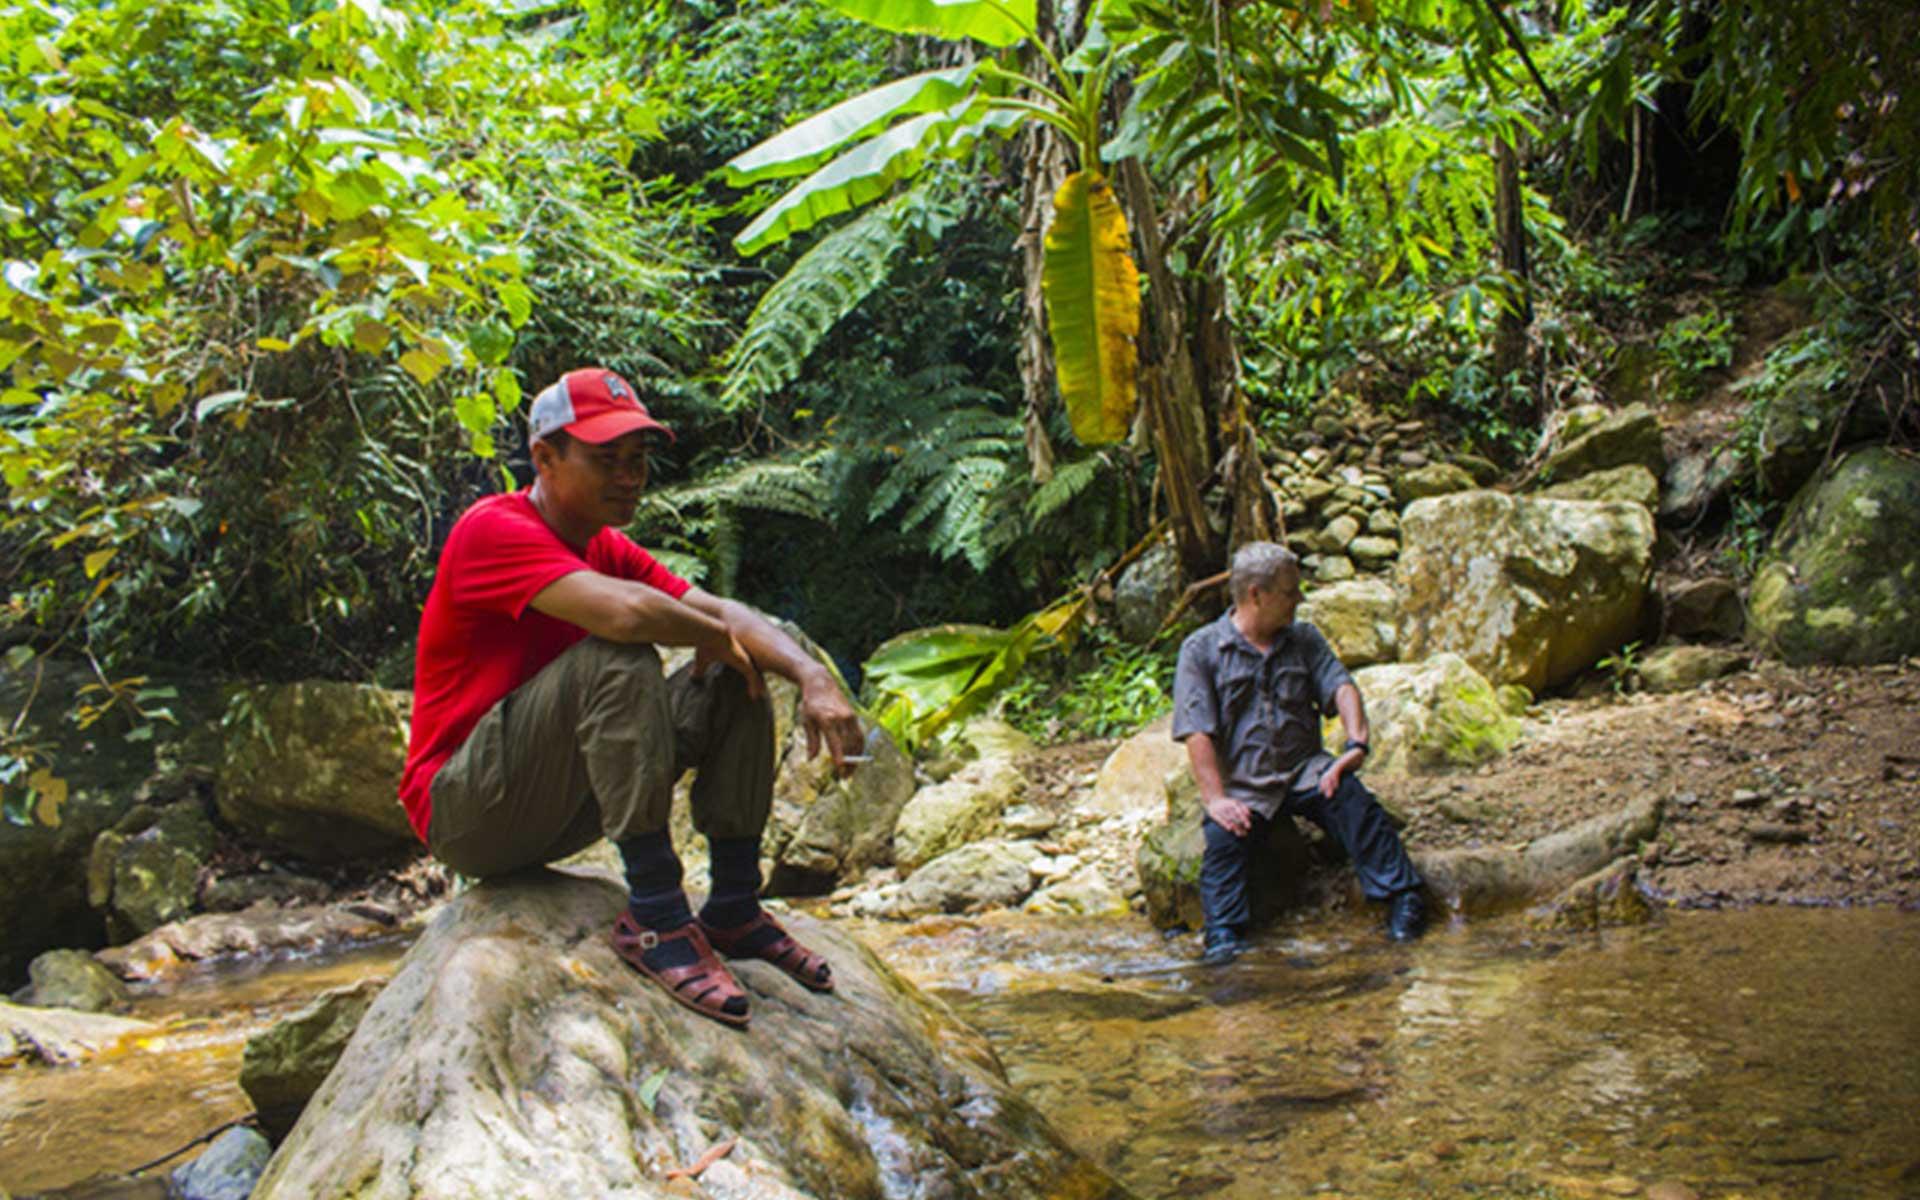 Jungle trekking before reaching Son Doong cave